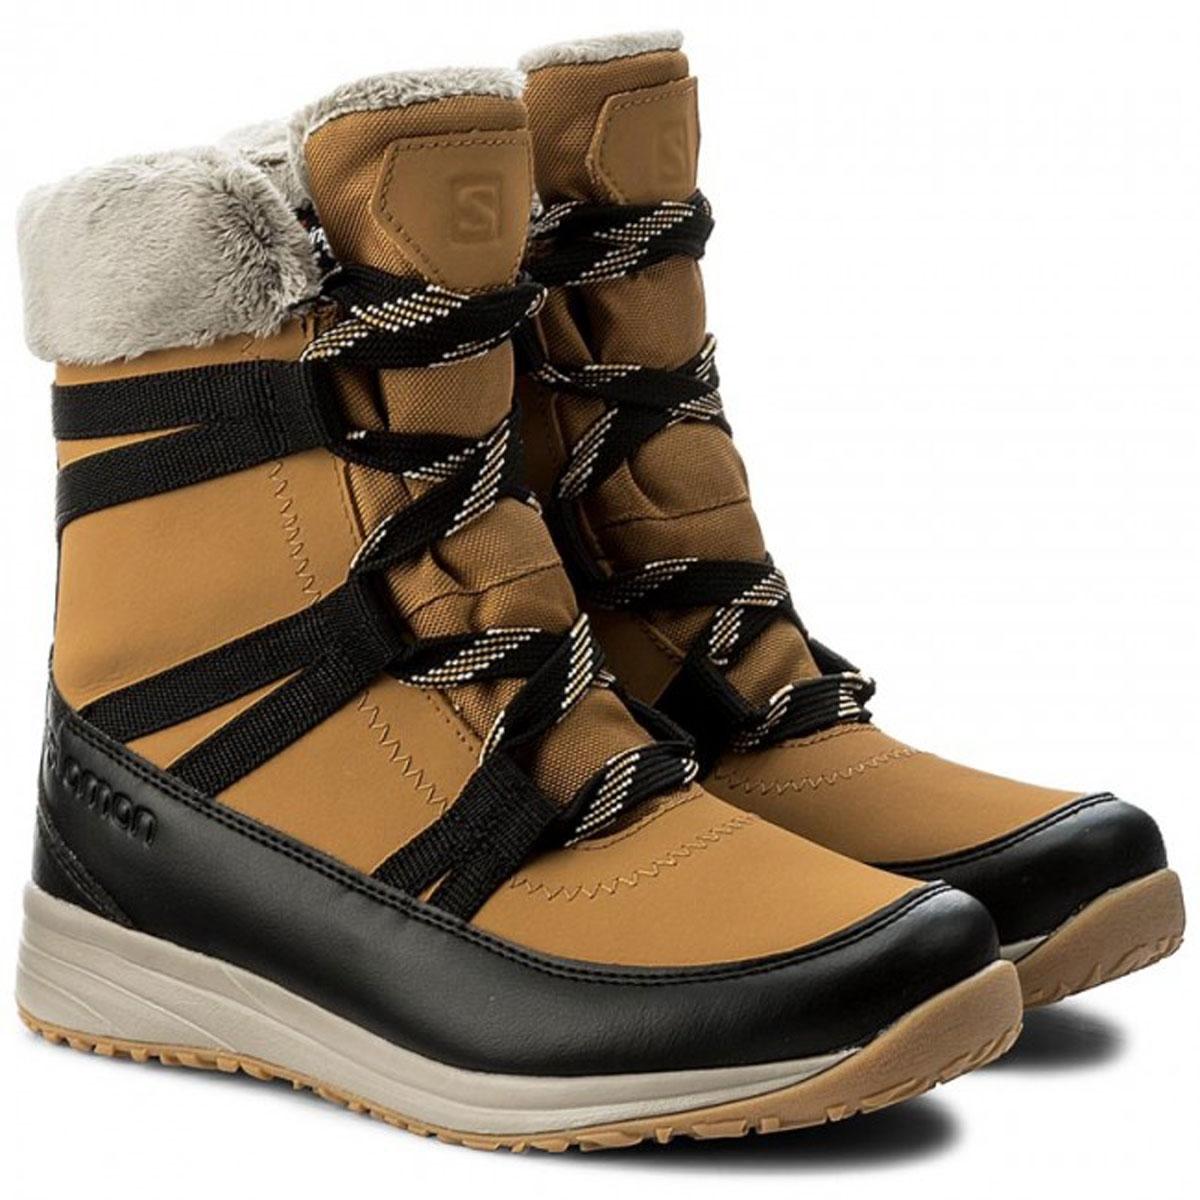 9087f766d3bf ... Image of Salomon Heika LTR CS WP Womens Winter Boots (Women s) - Camel  Gold. «